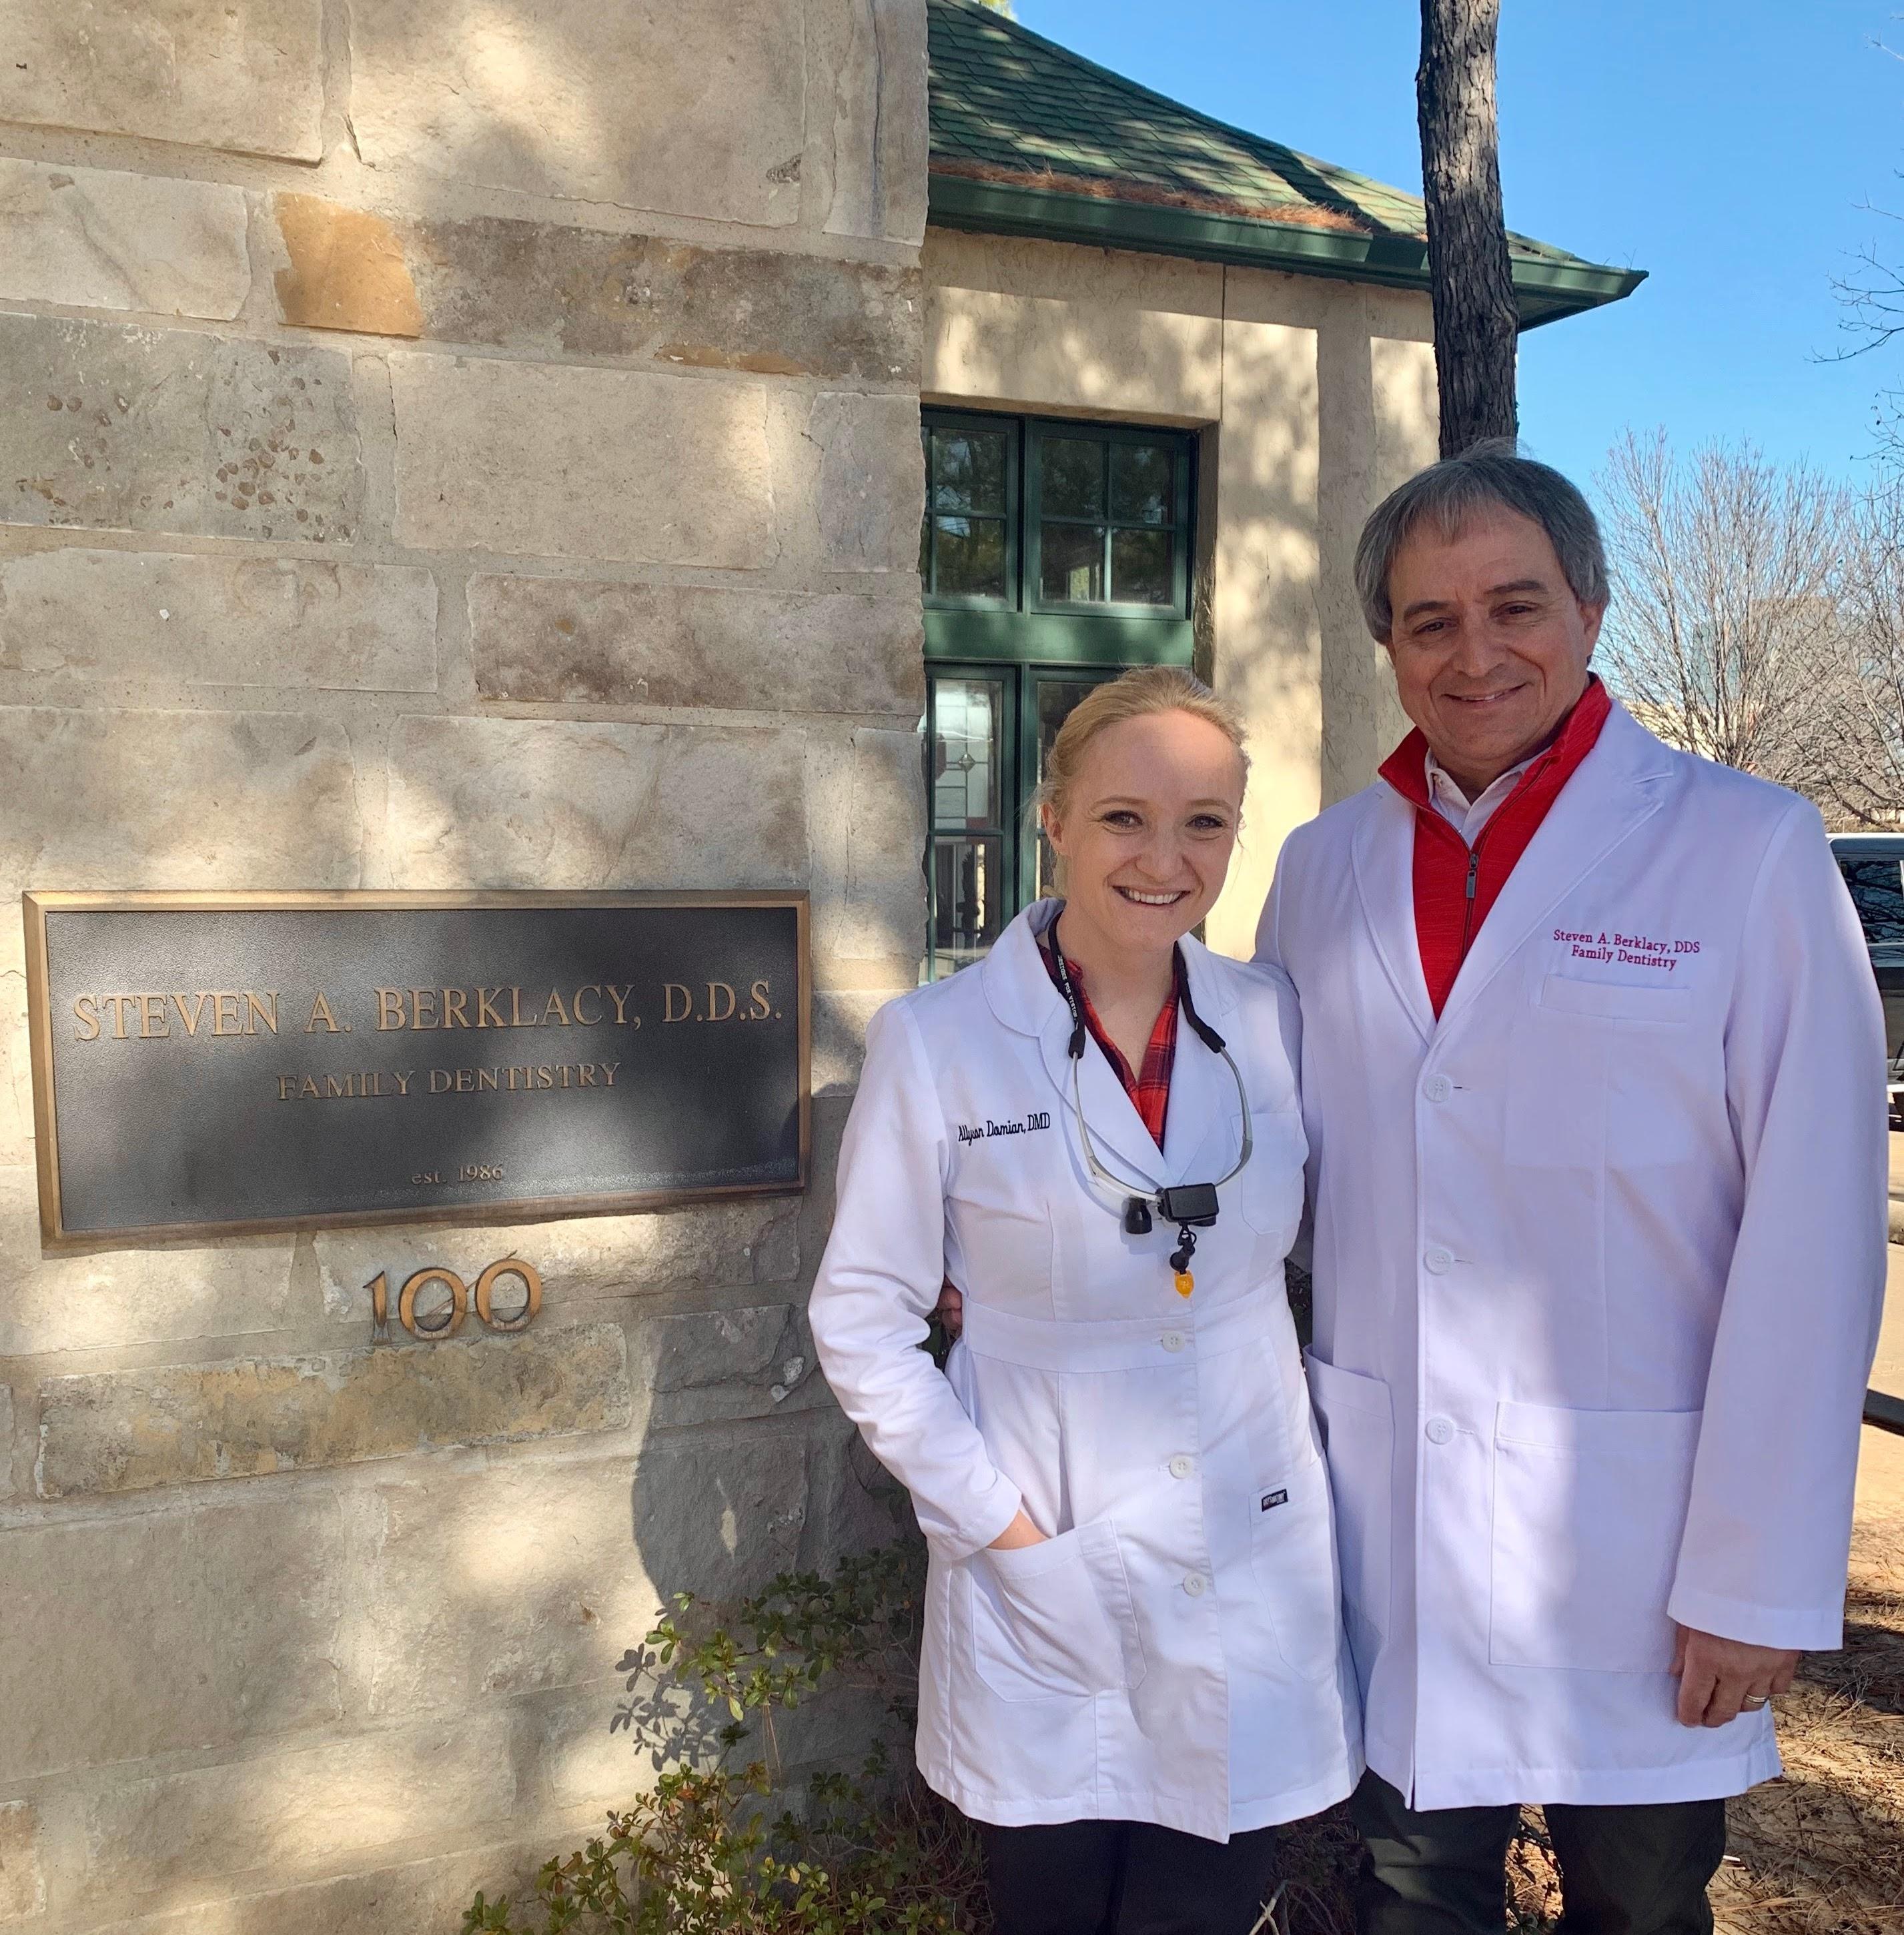 Steven A. Berklacy DDS & Allyson P. Domian DMD Family Dentistry